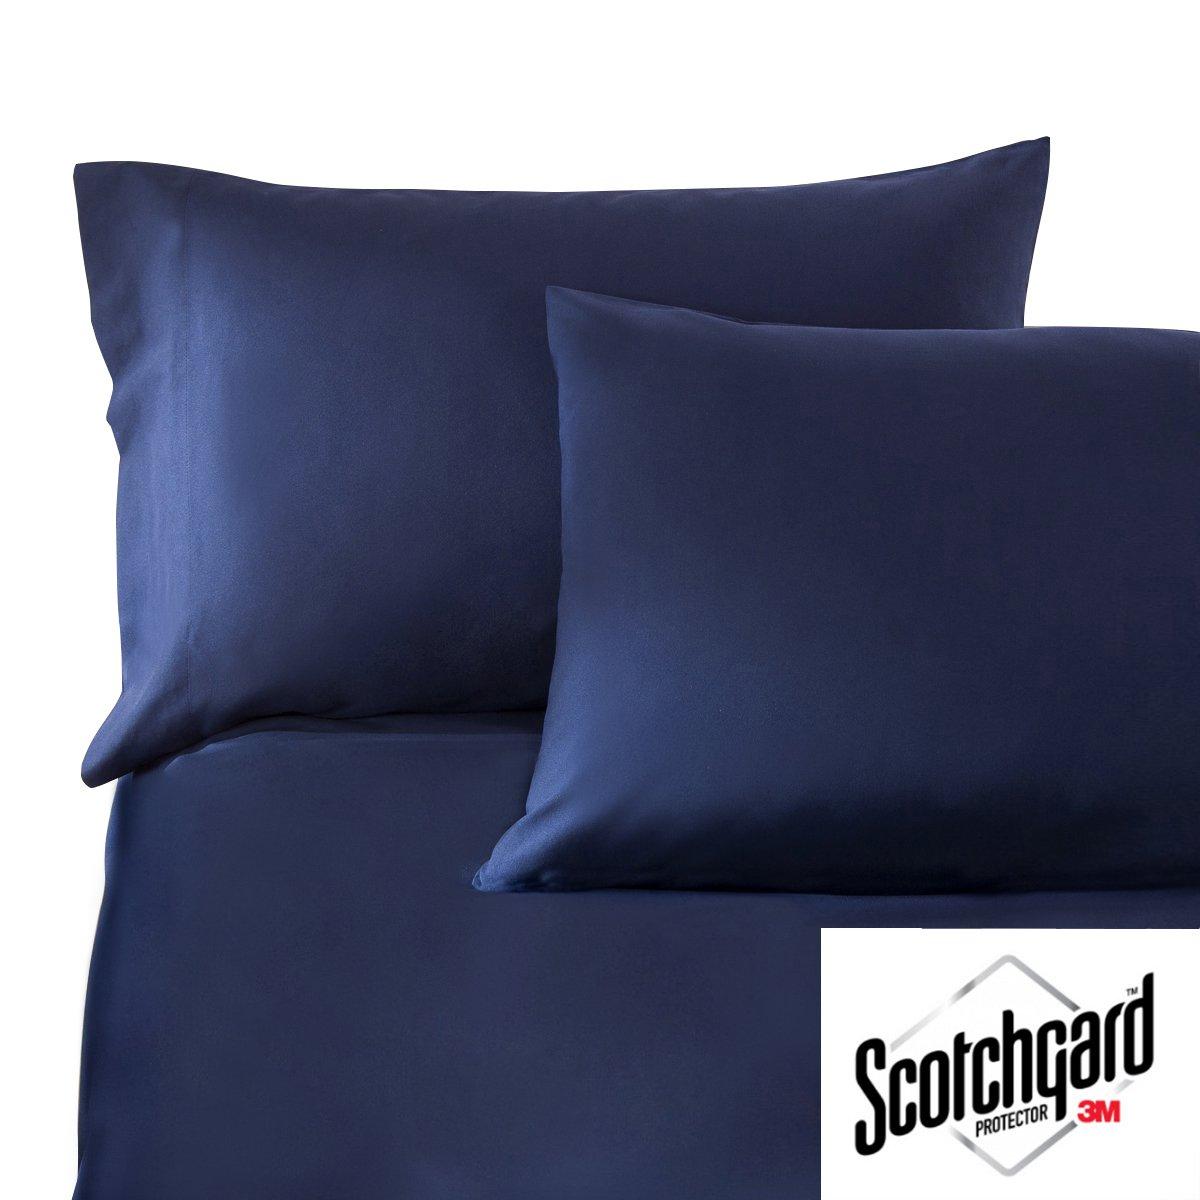 HONEYMOON HOME FASHIONS King Navy 3M Scotchgard Bed Sheet Set